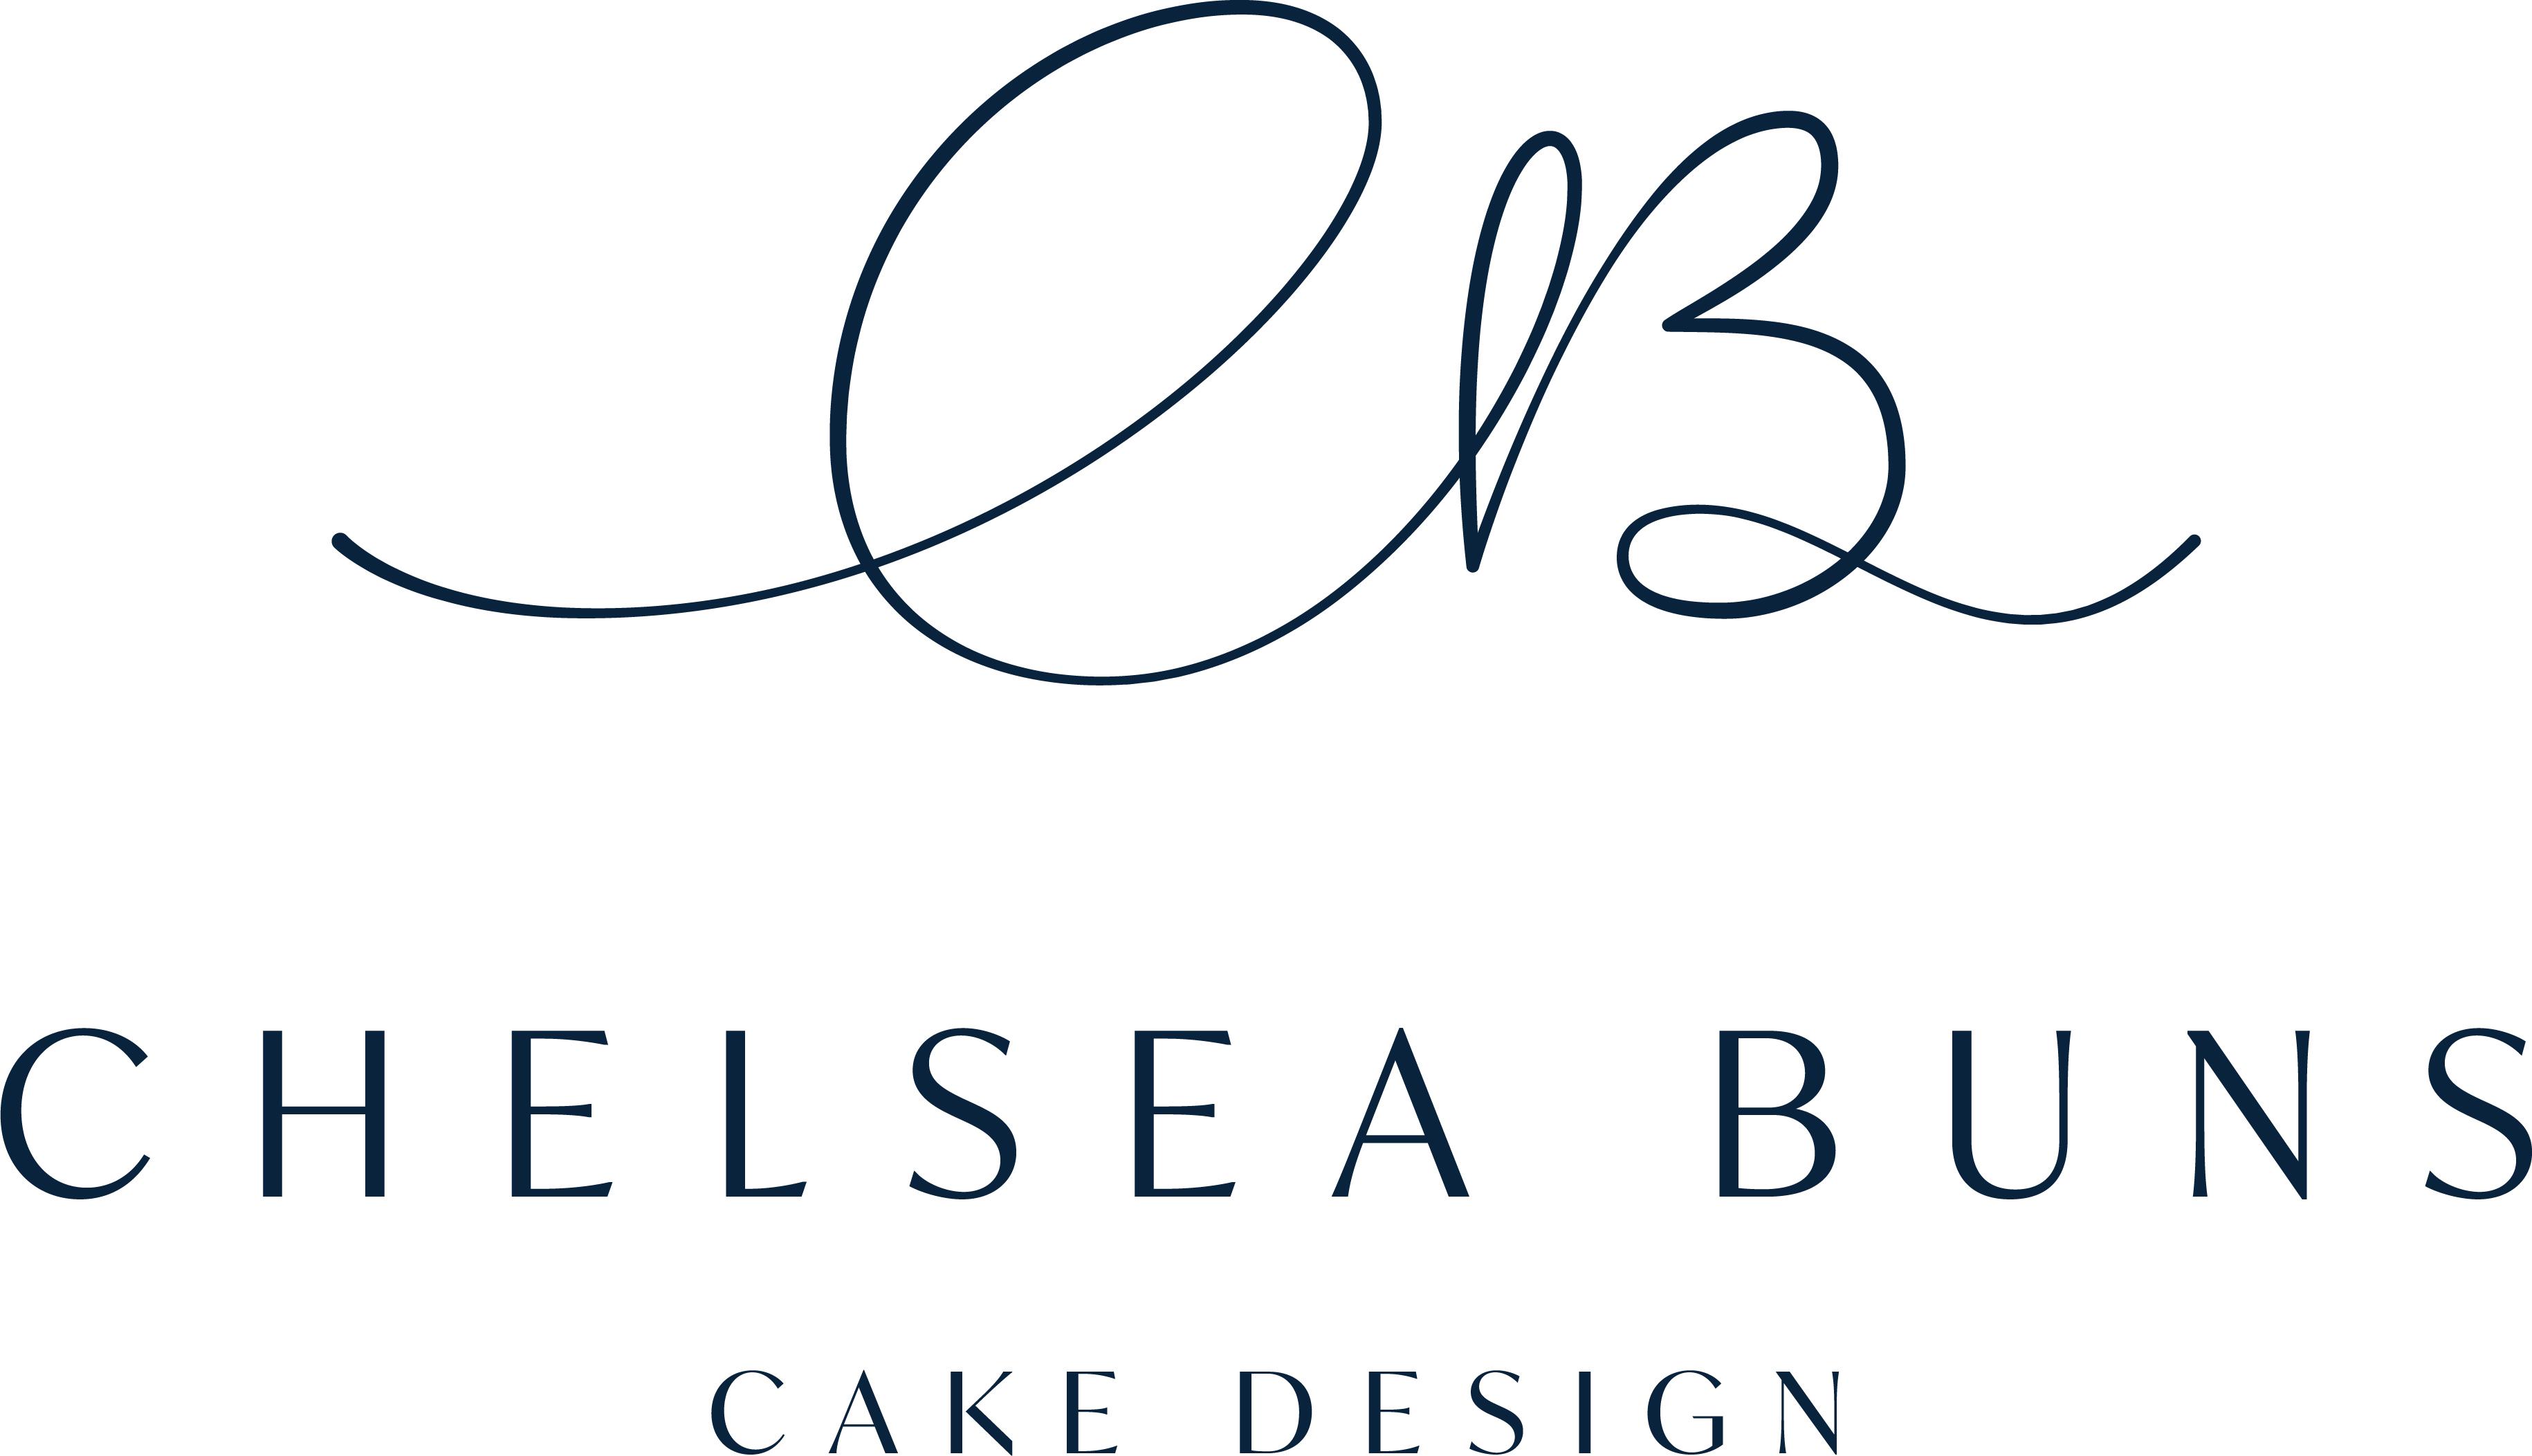 Chelsea Buns Cake Design